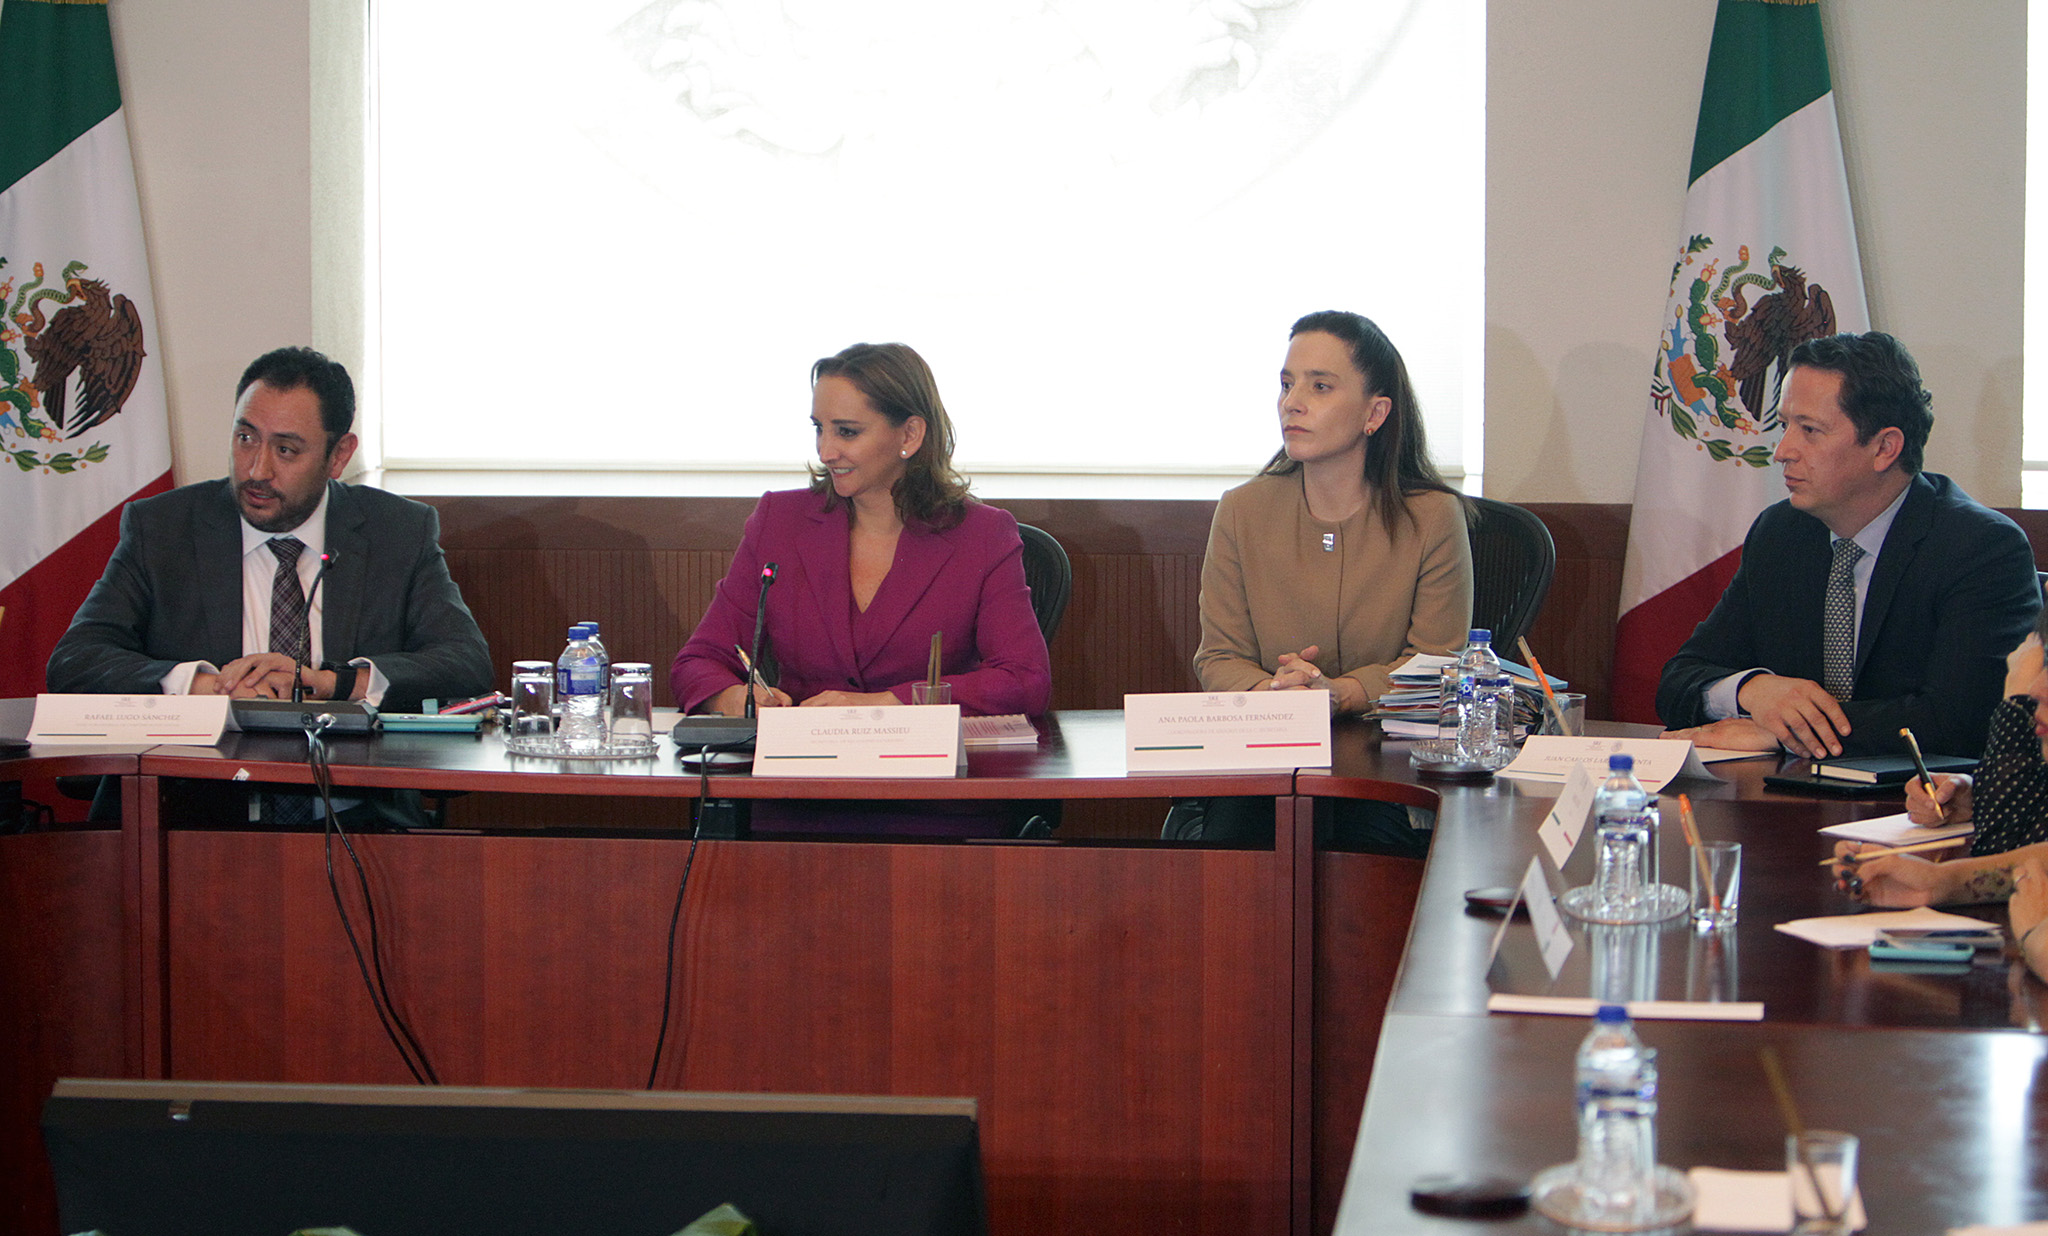 FOTO 3 Rafael Lugo  Canciller Claudia Ruiz Massieu  Ana Paola Barbosa y Juan Carlos Lara.jpg